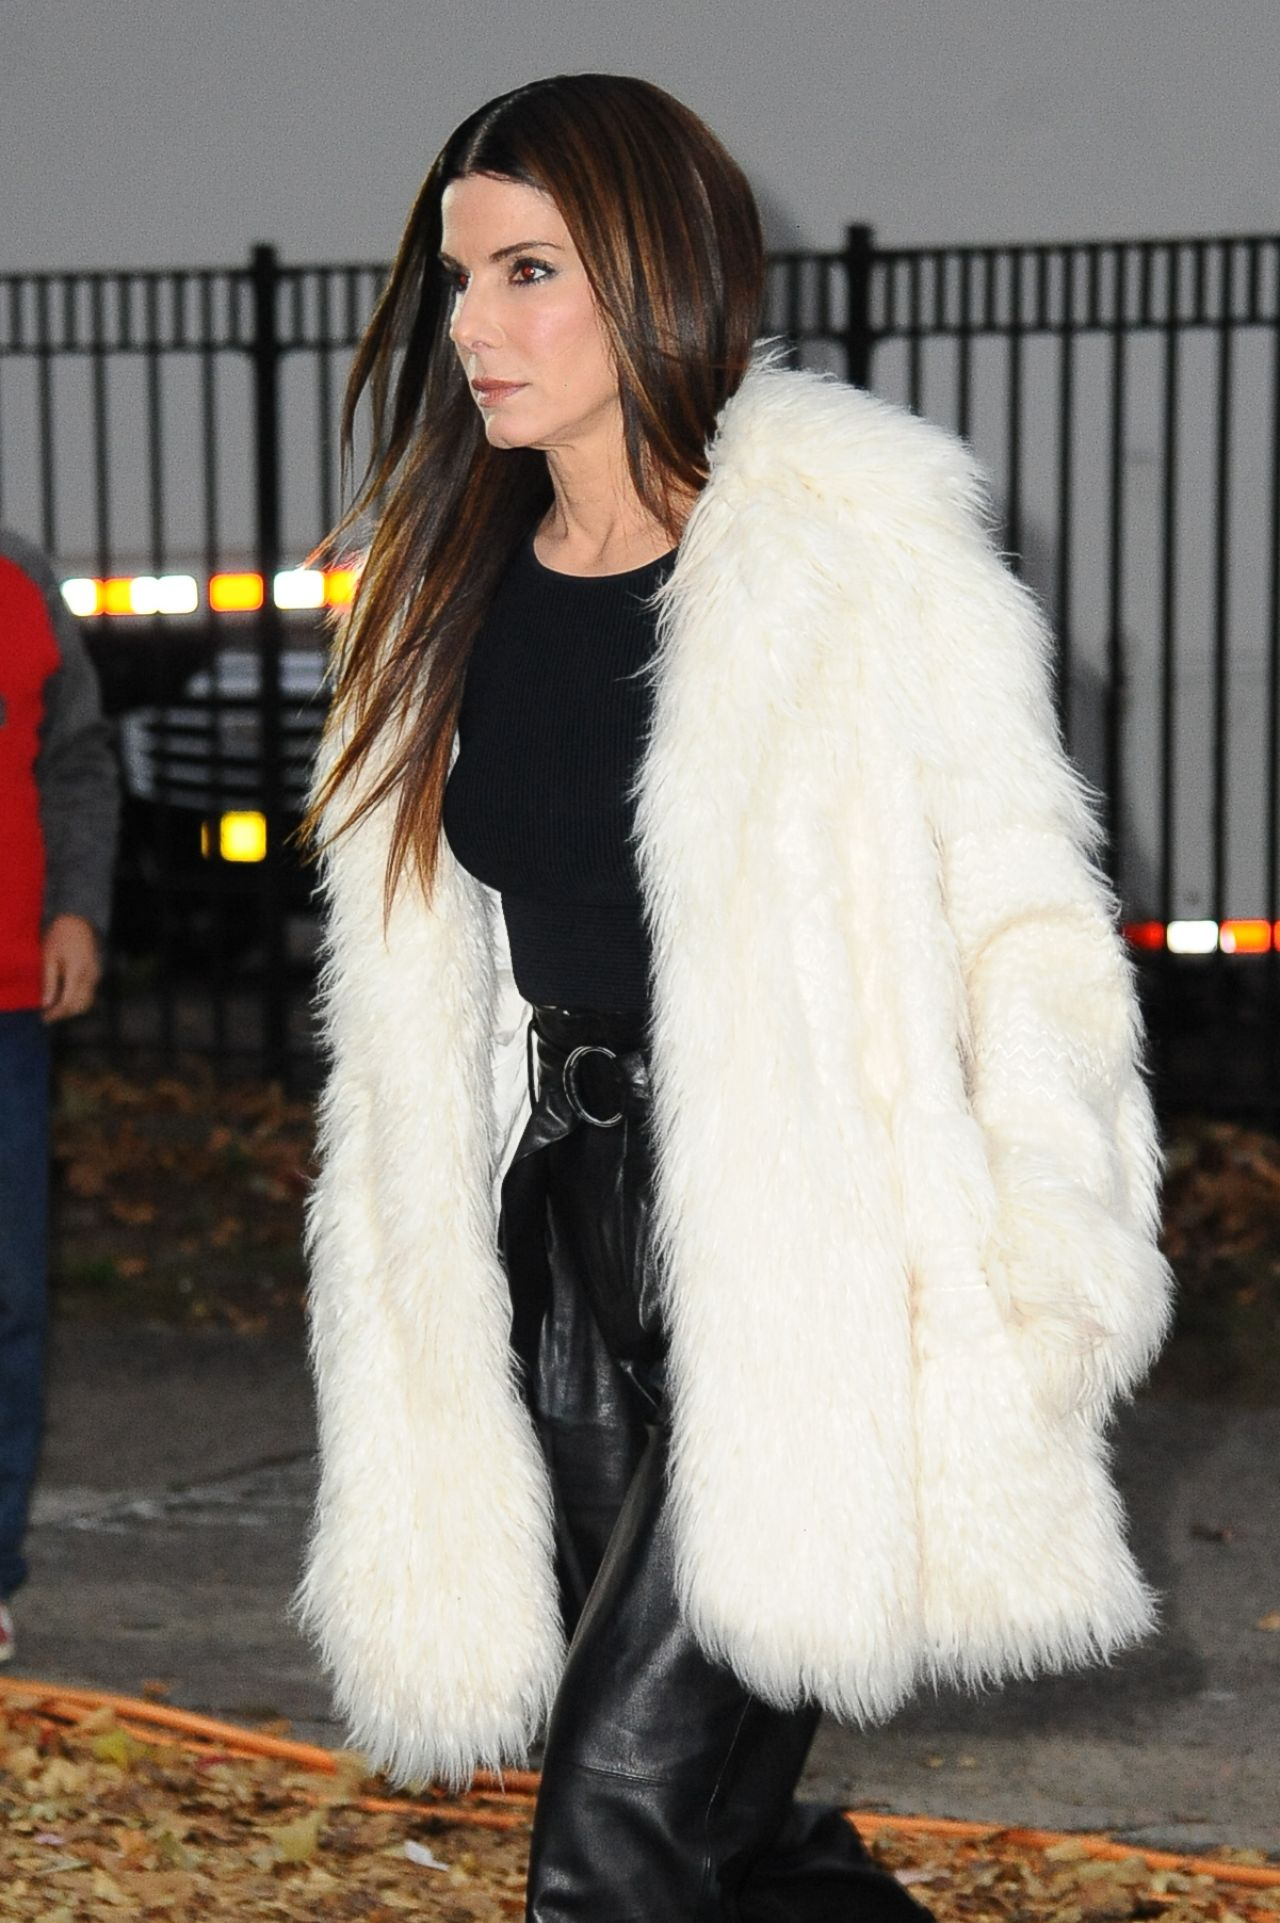 Sandra Bullock Looking Fancy In Fur For Oceans Eight